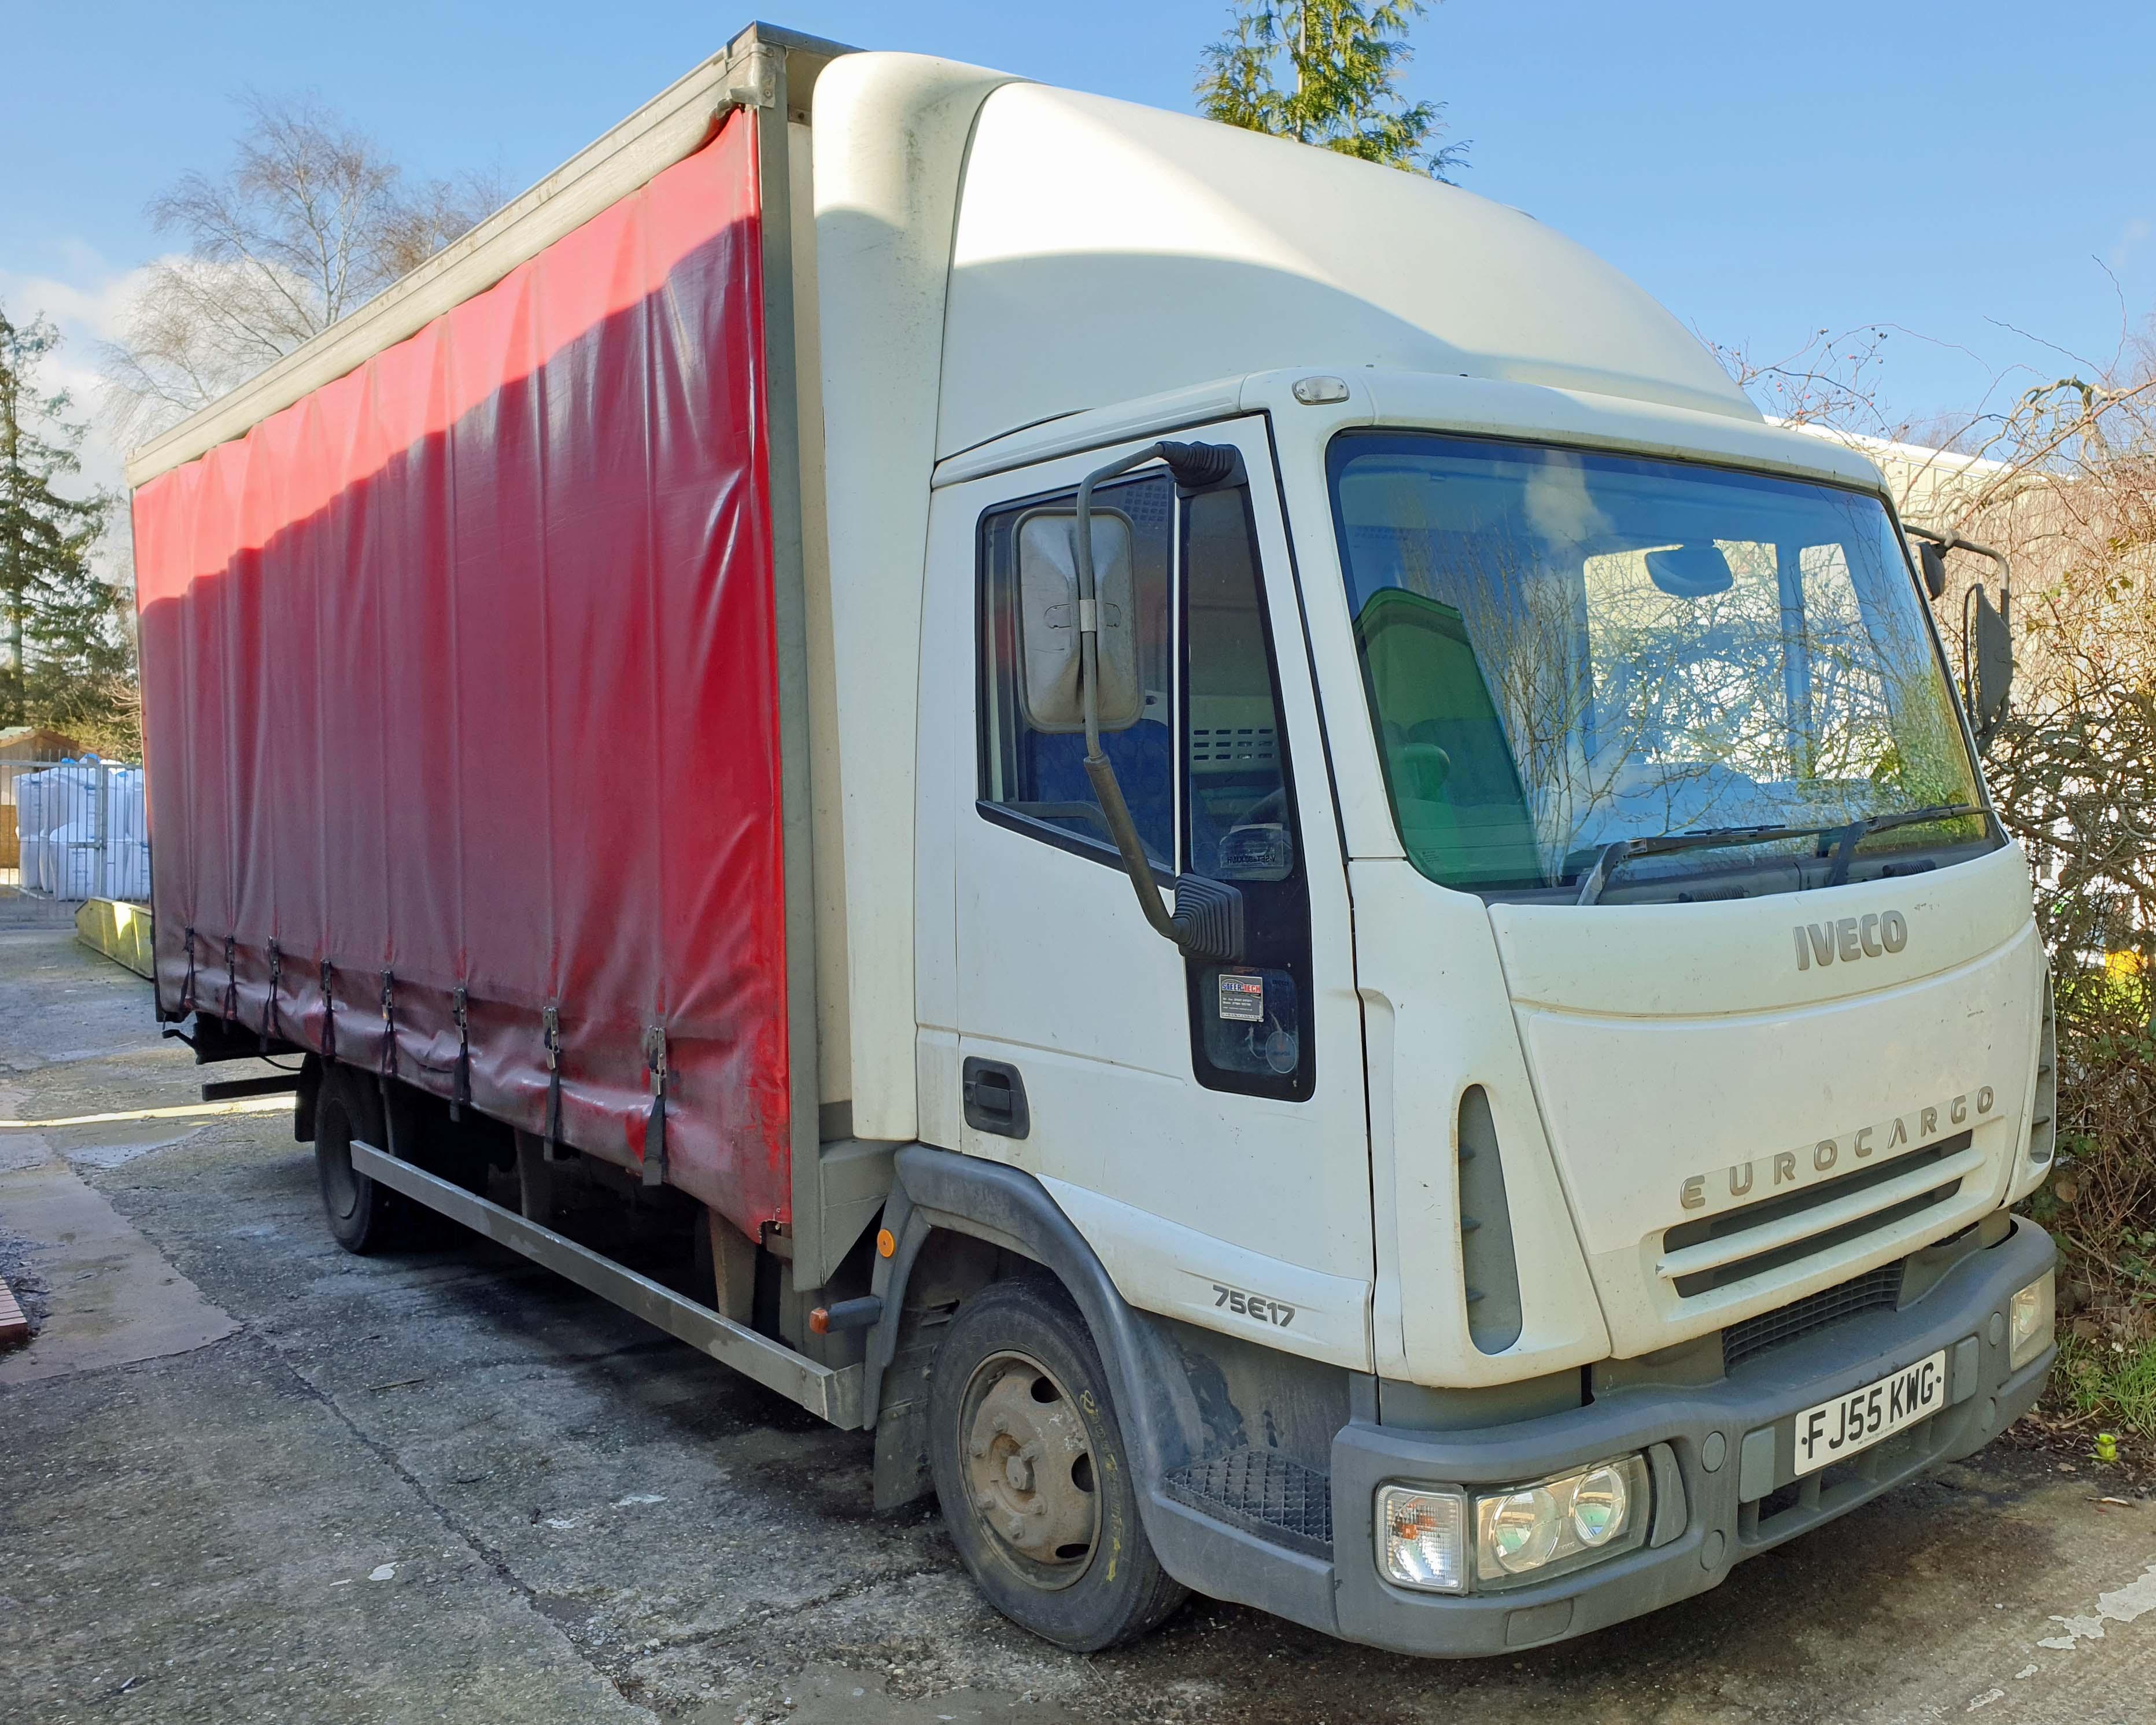 An IVECO Eurocargo ML 75 E17 3920cc 4x2 7.5-Tonne Curtainside Truck, Registration No. FJ55 KWG,